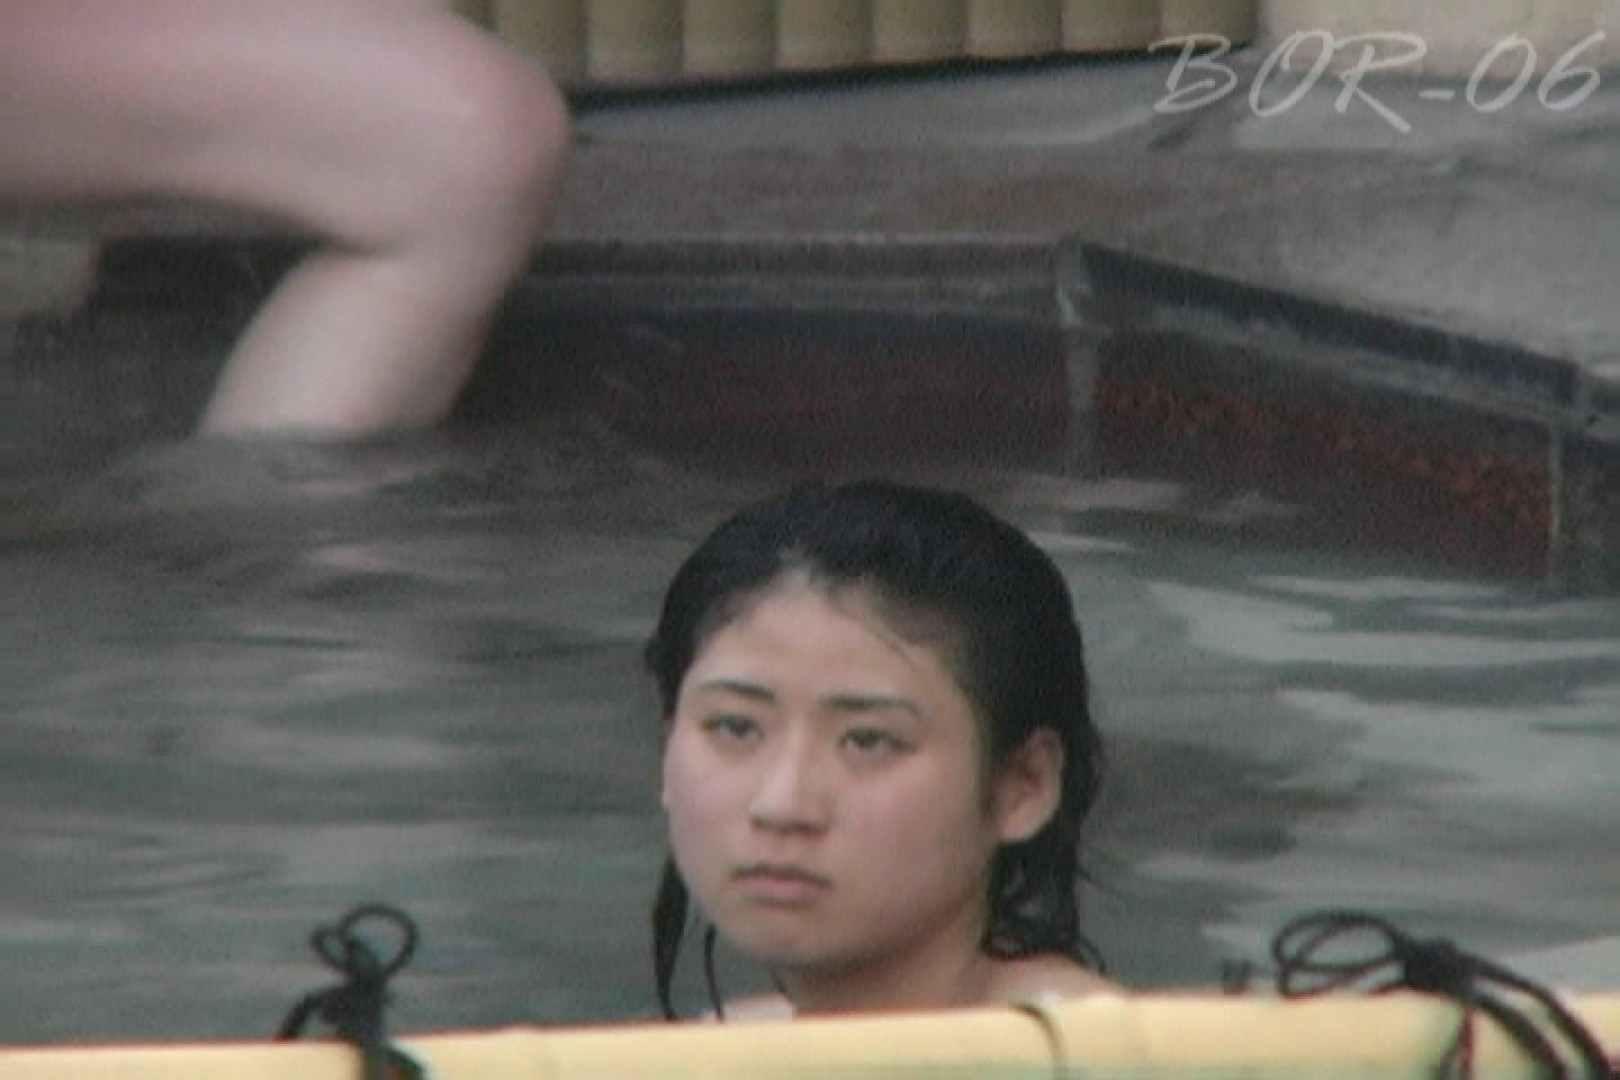 Aquaな露天風呂Vol.520 OL女体  52連発 12